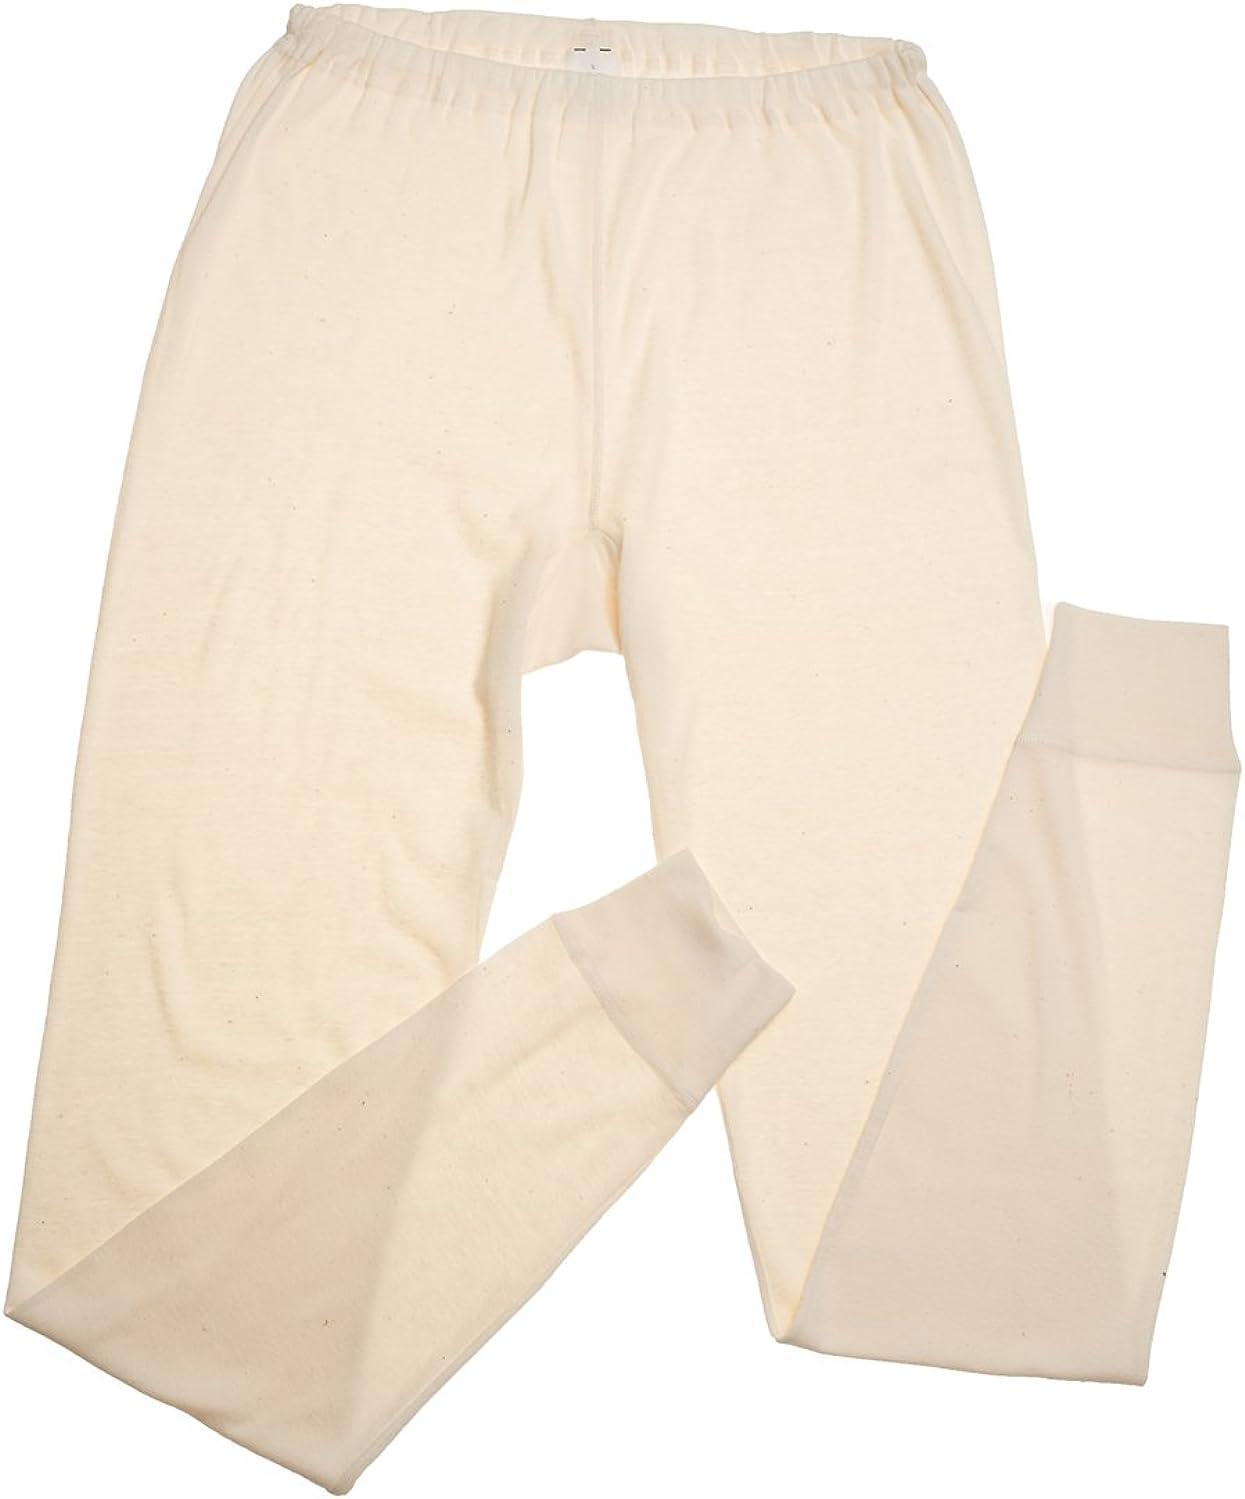 HOCOSA Womens Long-Underwear Pants in Organic Cotton//Hemp Blend